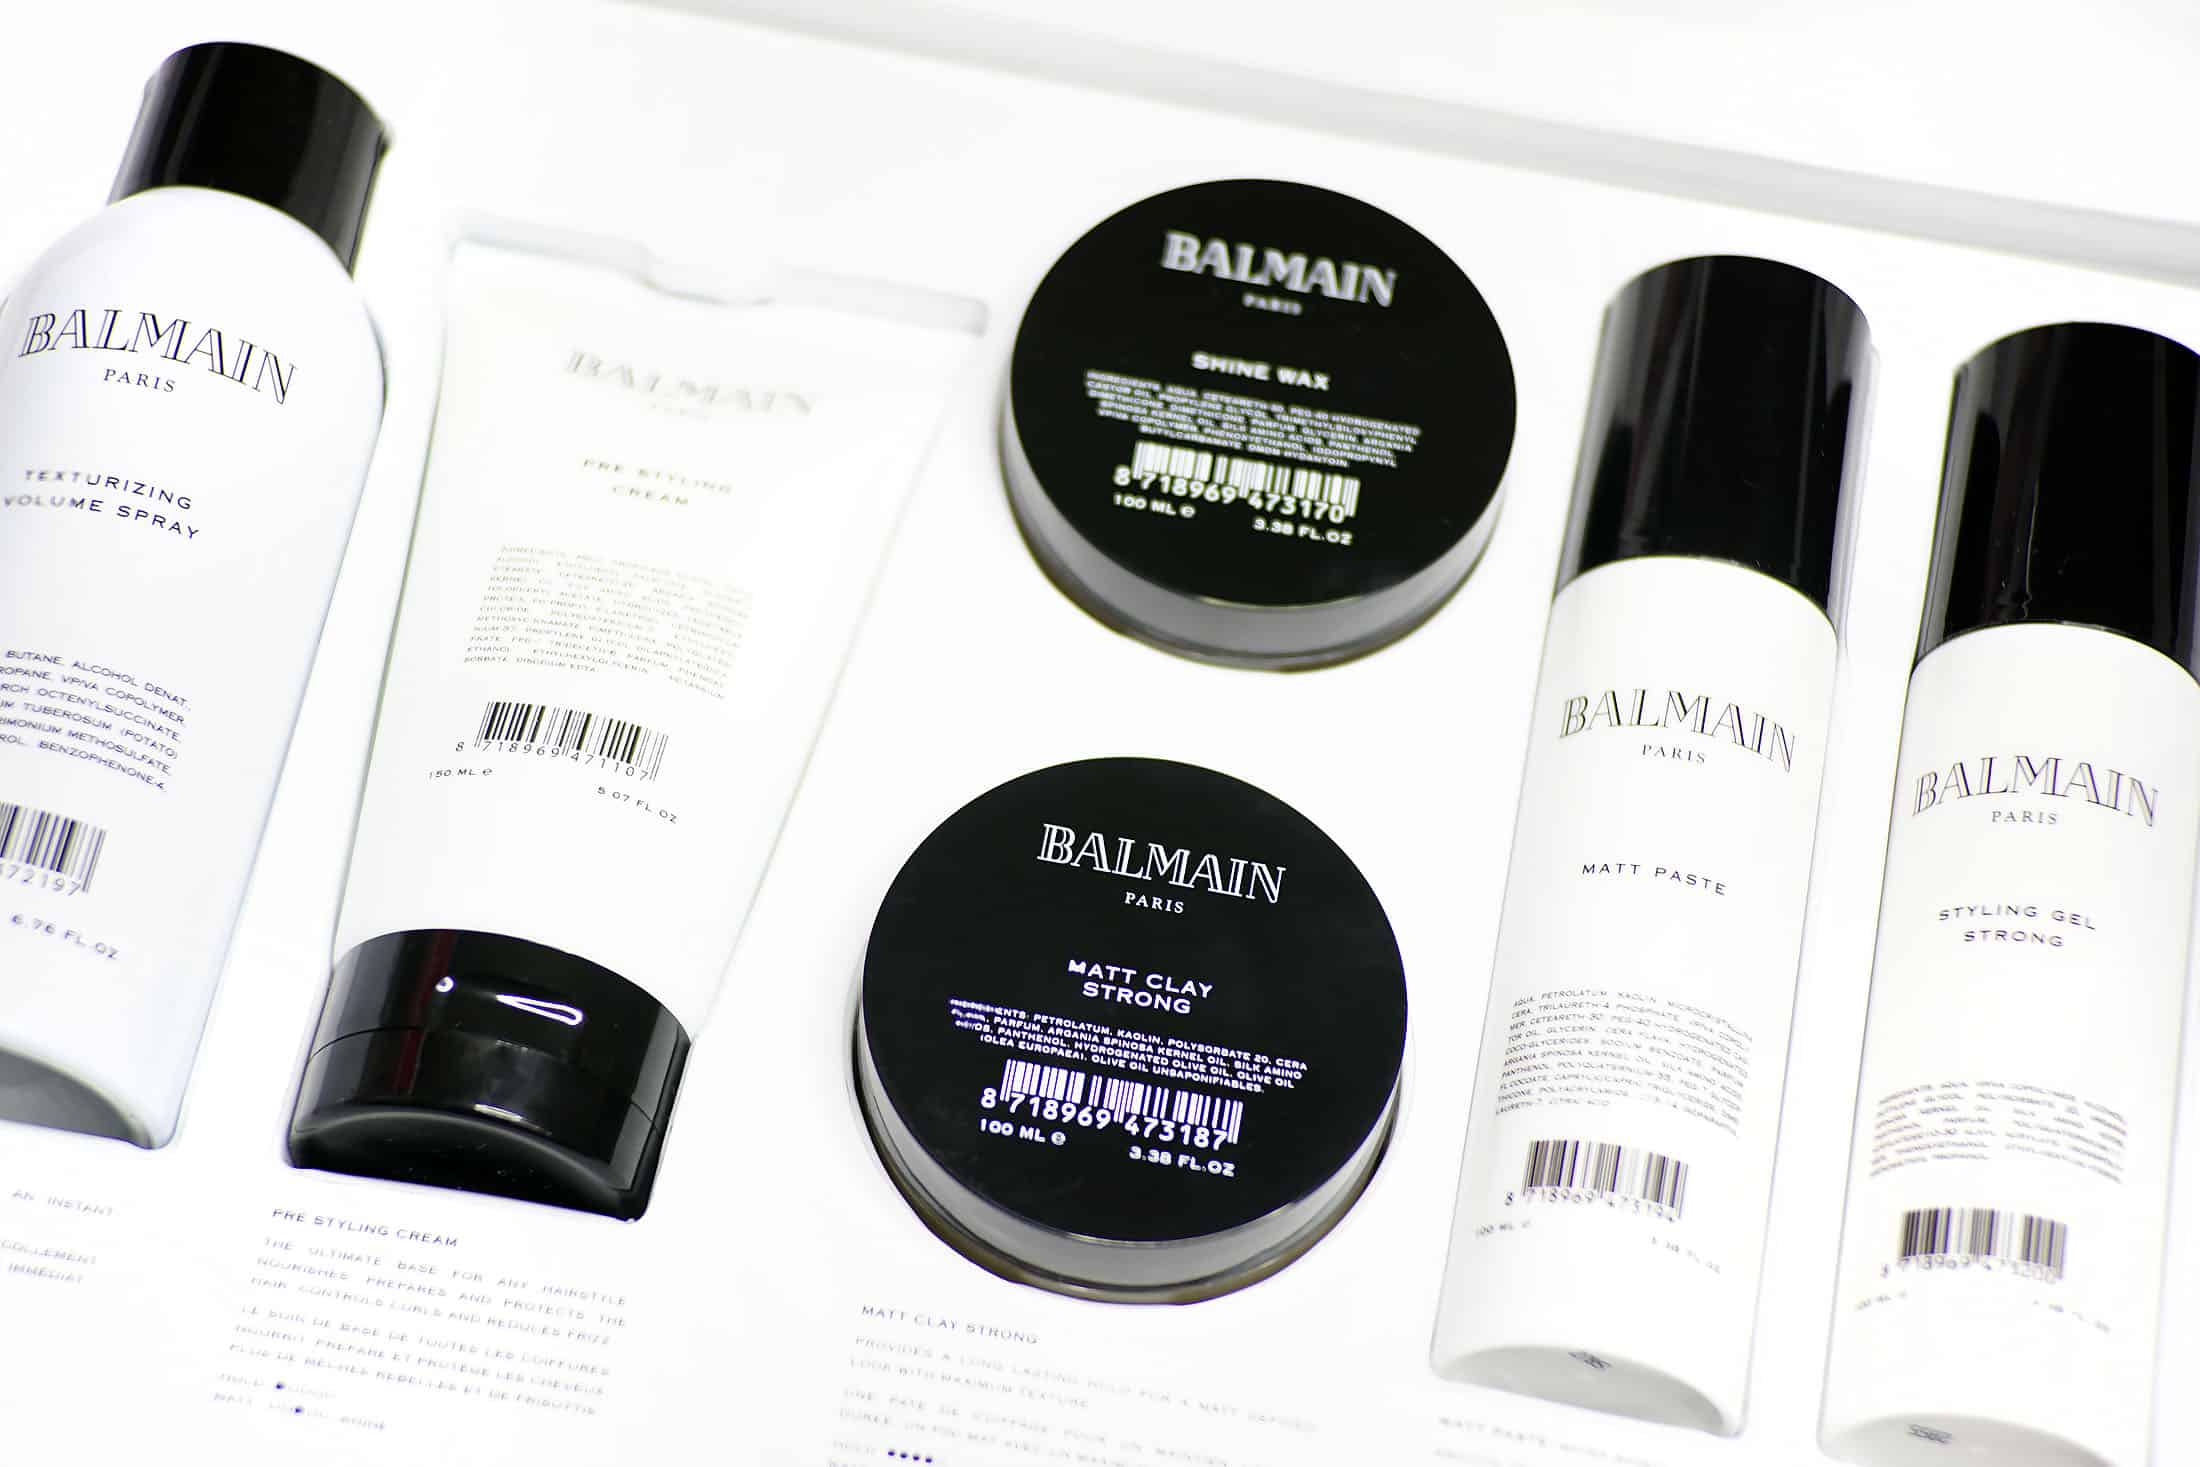 Hair Styling from Balmain